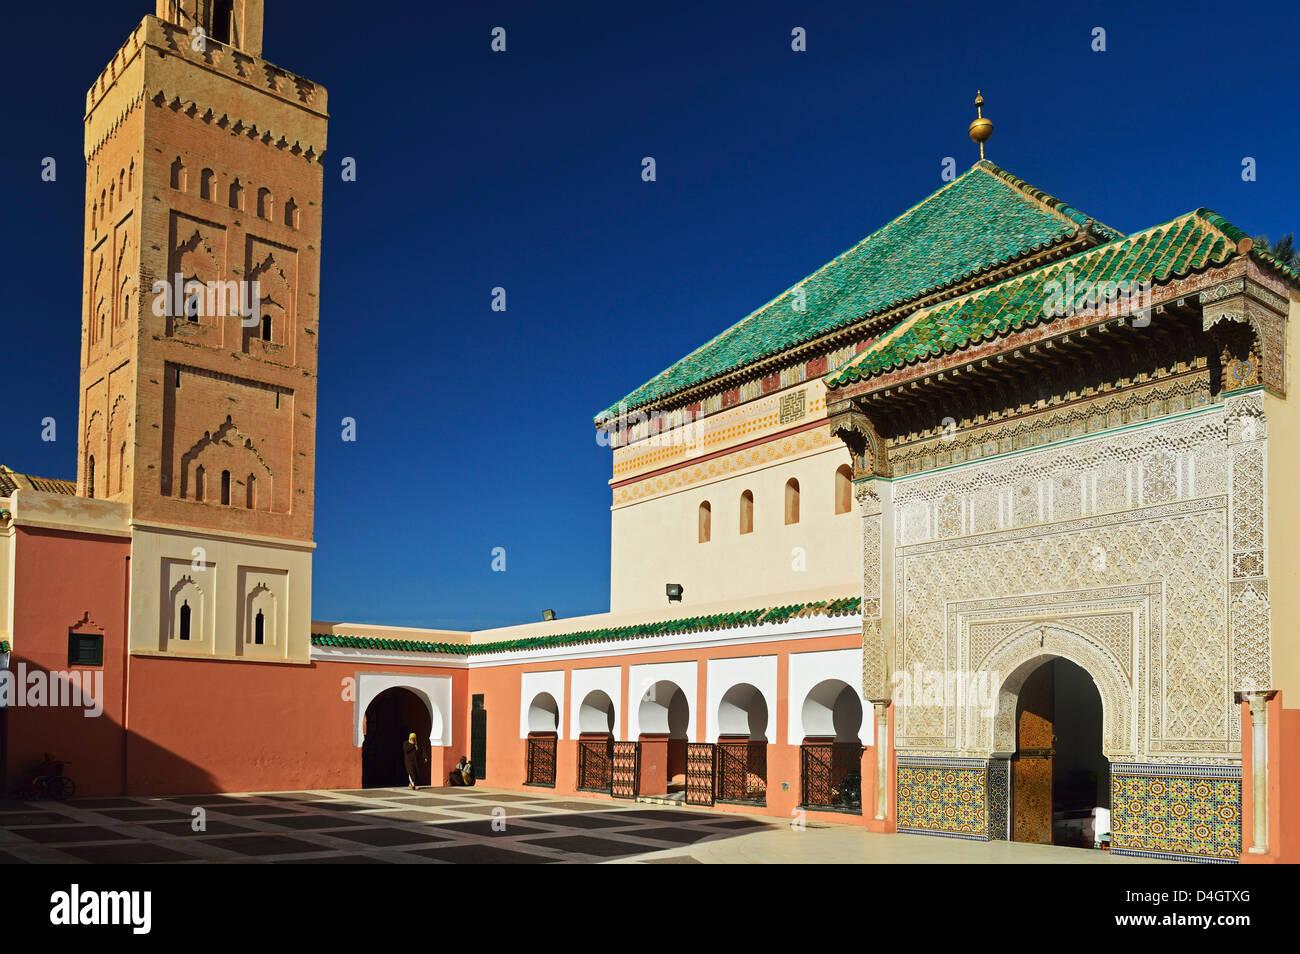 Zaouia Sidi Bel Abbes, Medina, Marrakesh, Morocco, North Africa Stock Photo